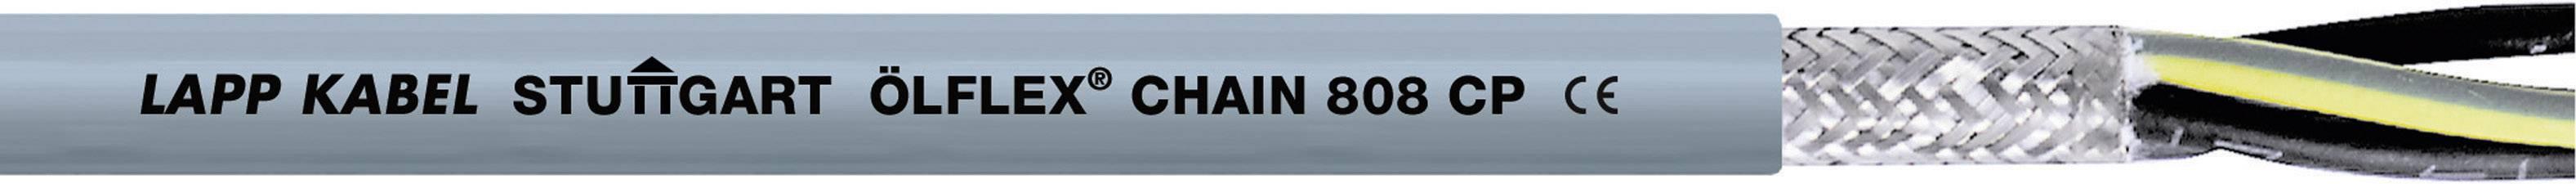 Žíla kabelu LappKabel ÖLFLEX CHAIN 808 CP 7G1,5 (1027779), 7x 1,5 mm², polyurethan, Ø 10,9 mm, stíněný, 100 m,